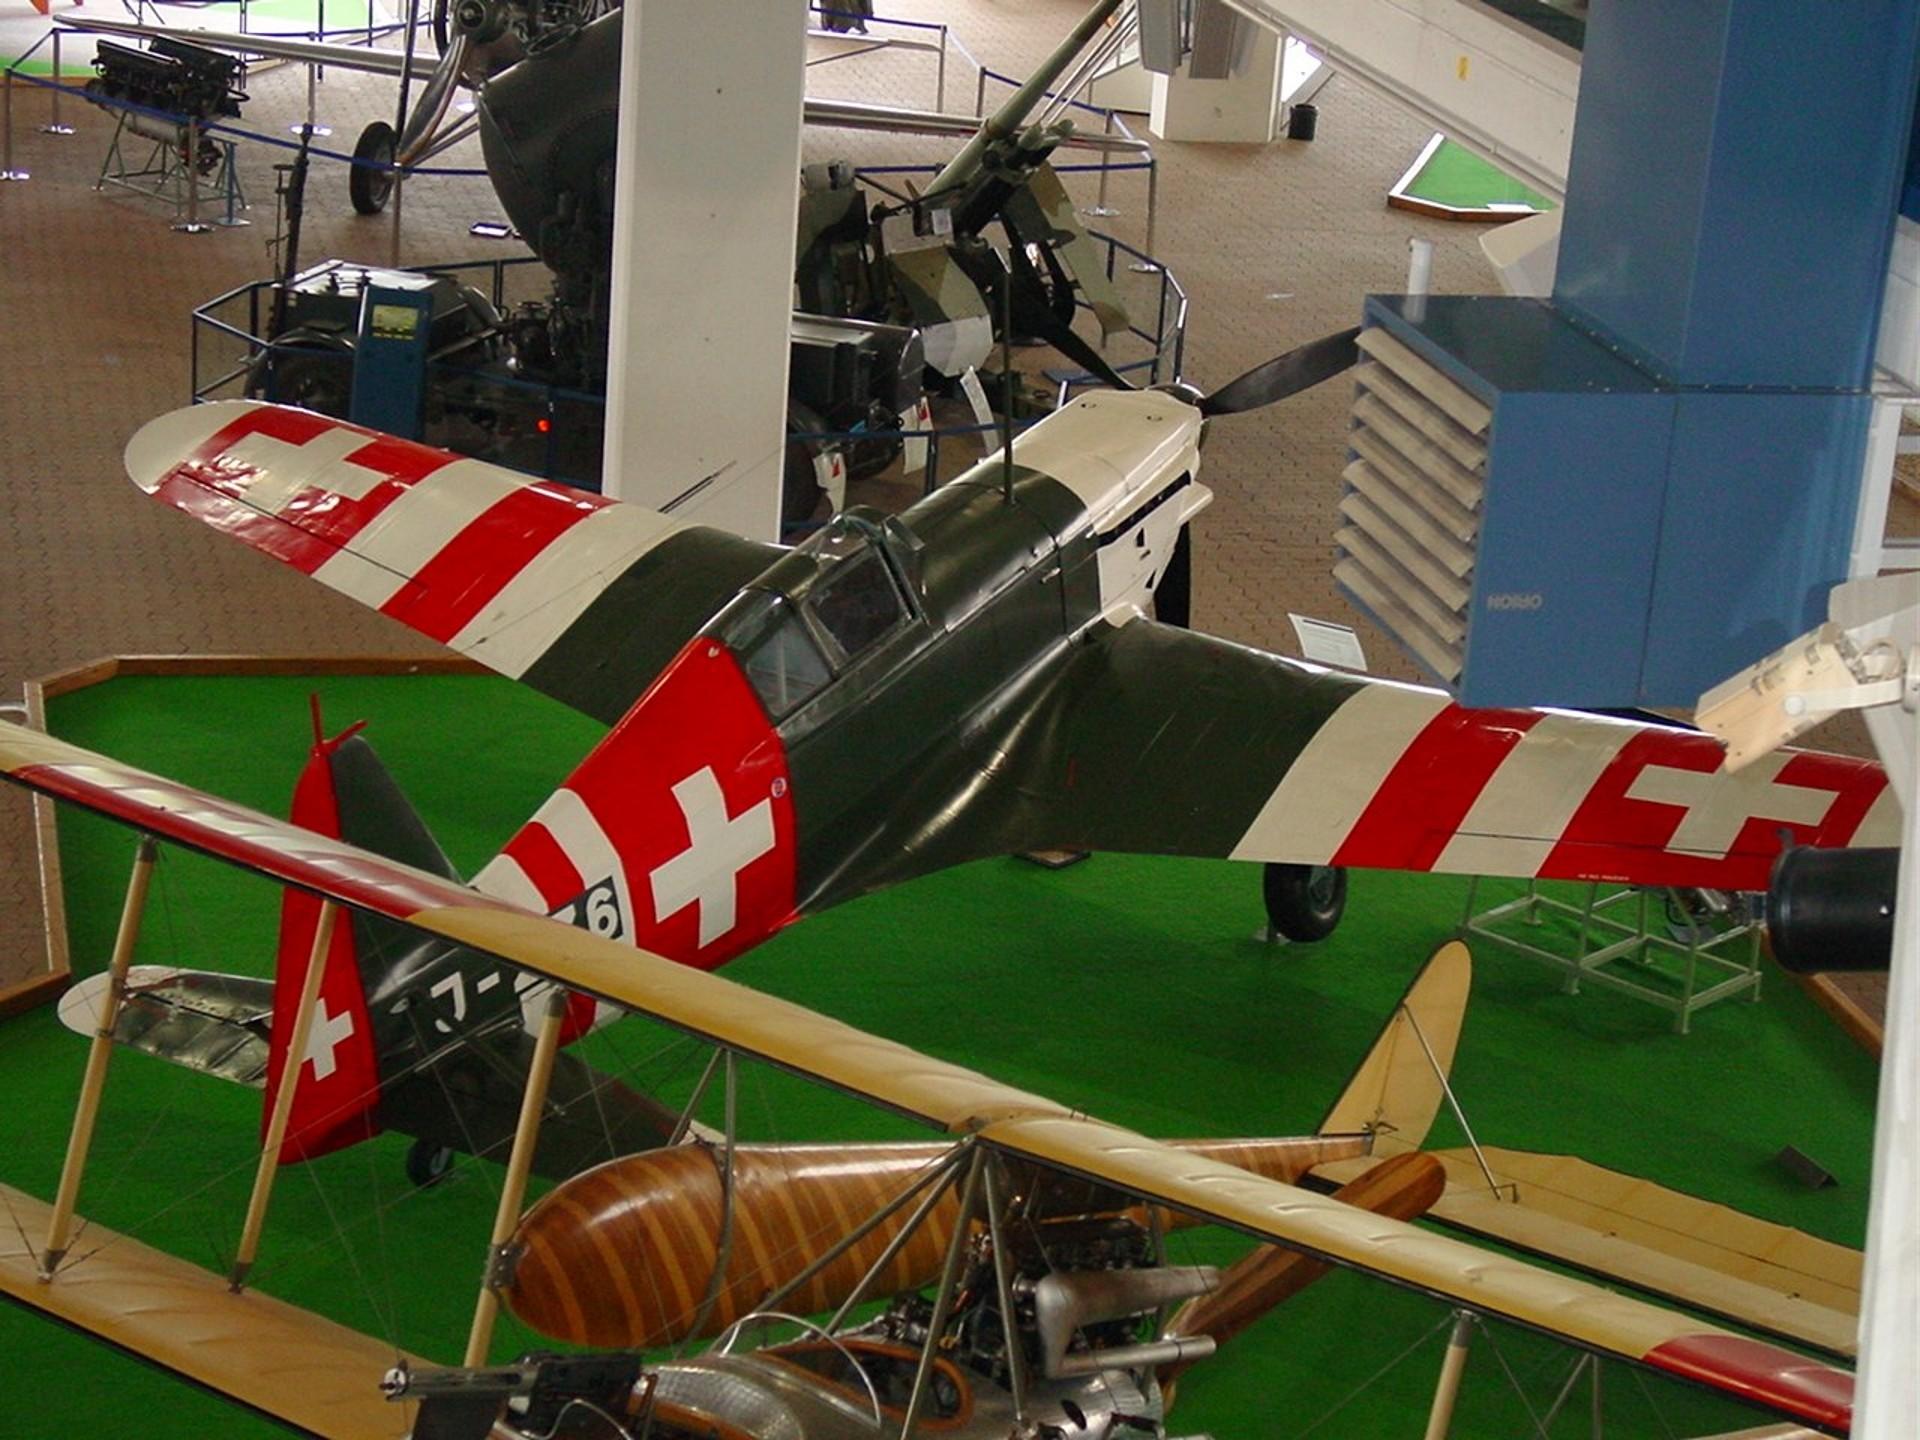 Morane-Saulnier MEVROUW 406